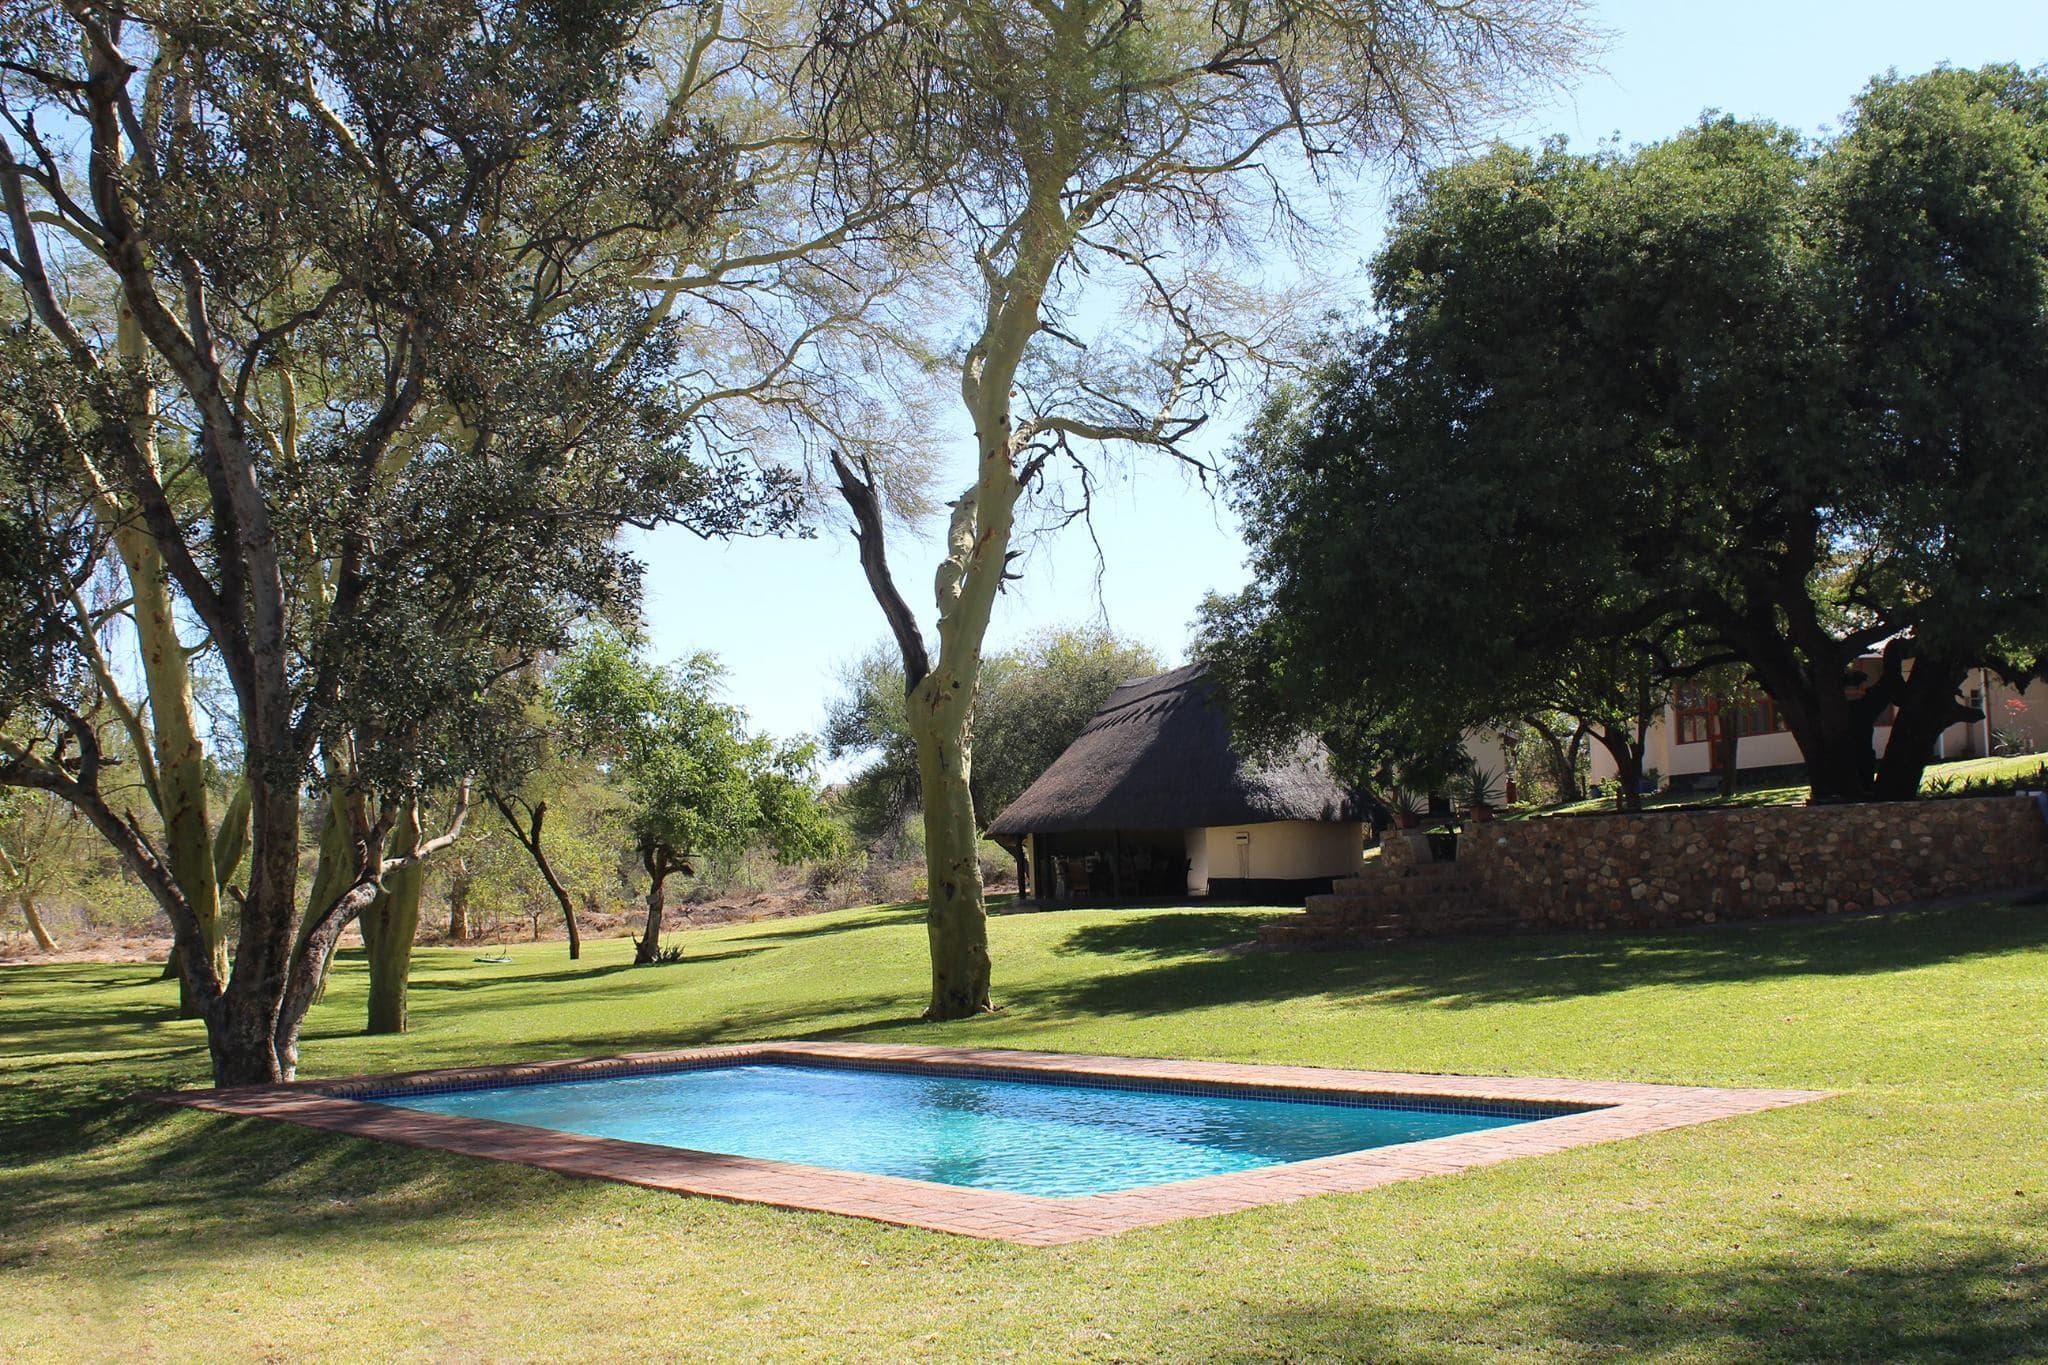 Kuduland River Lodge